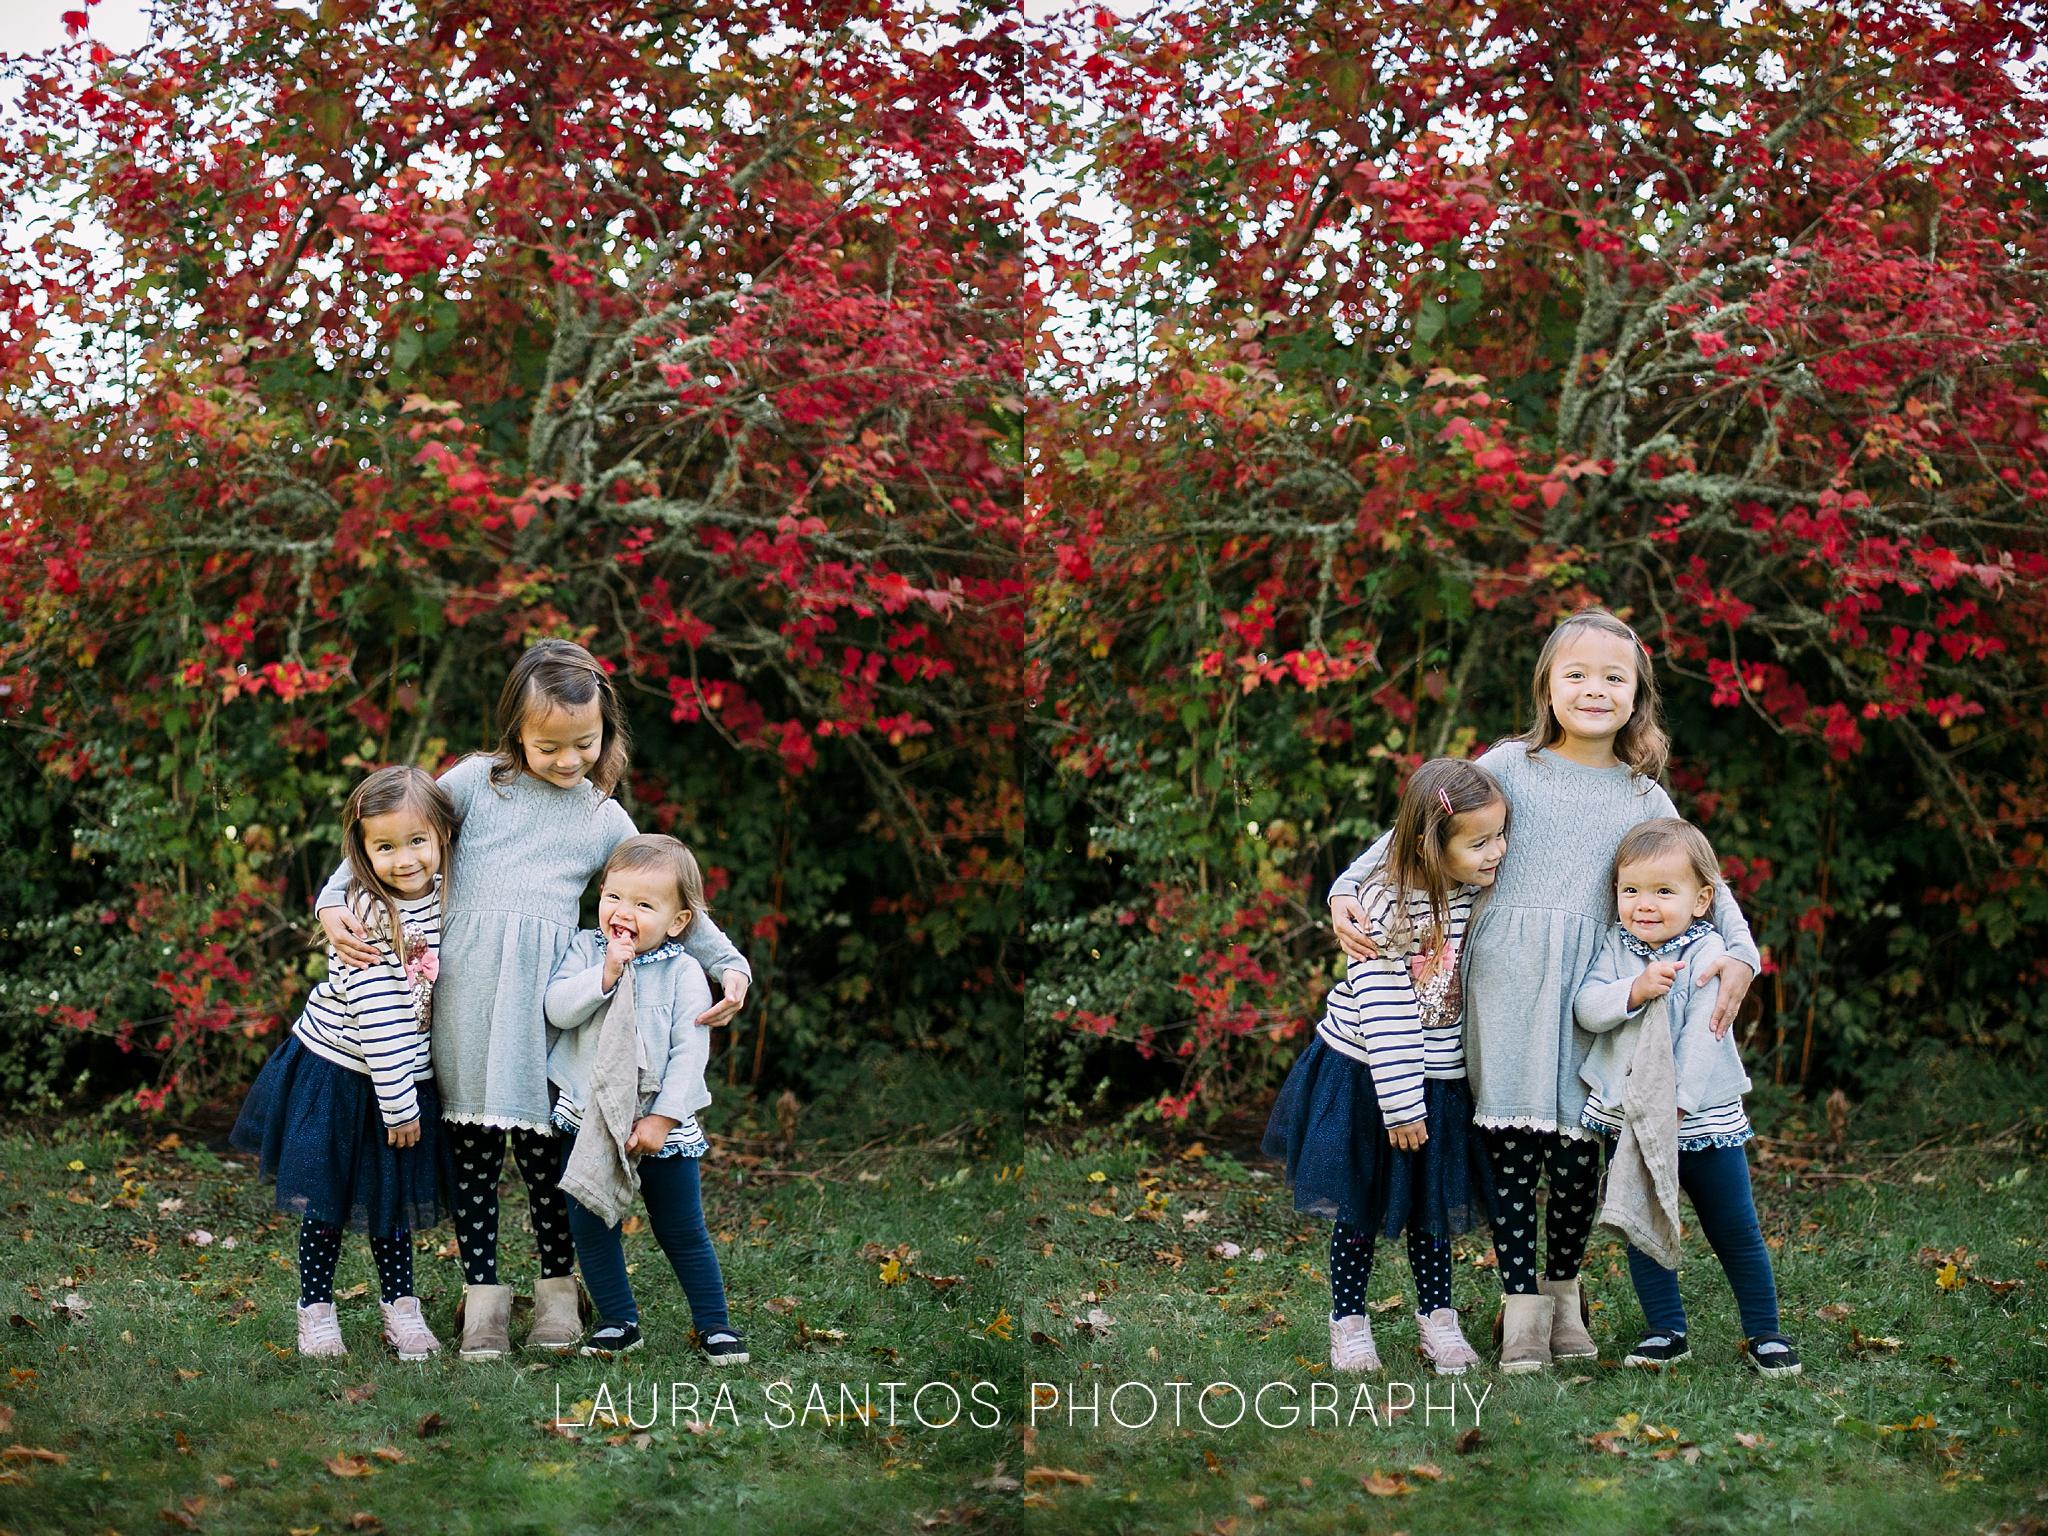 Laura Santos Photography Portland Oregon Family Photographer_0533.jpg